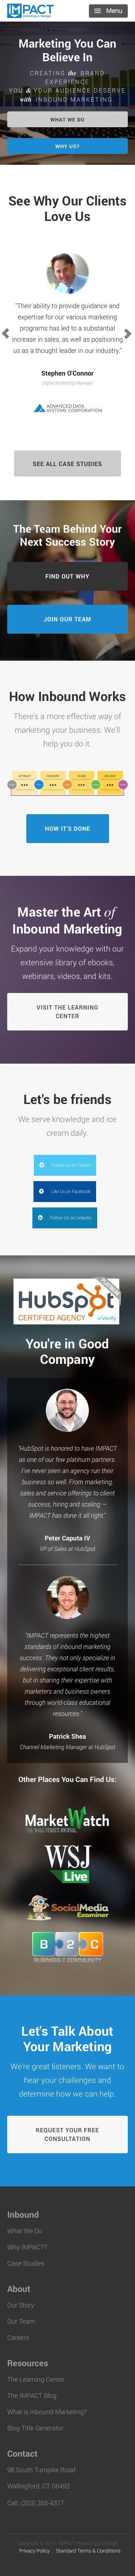 Screenshot of impactbnd.com - IMPACT | Inbound Marketing Agency - captured Nov. 26, 2014